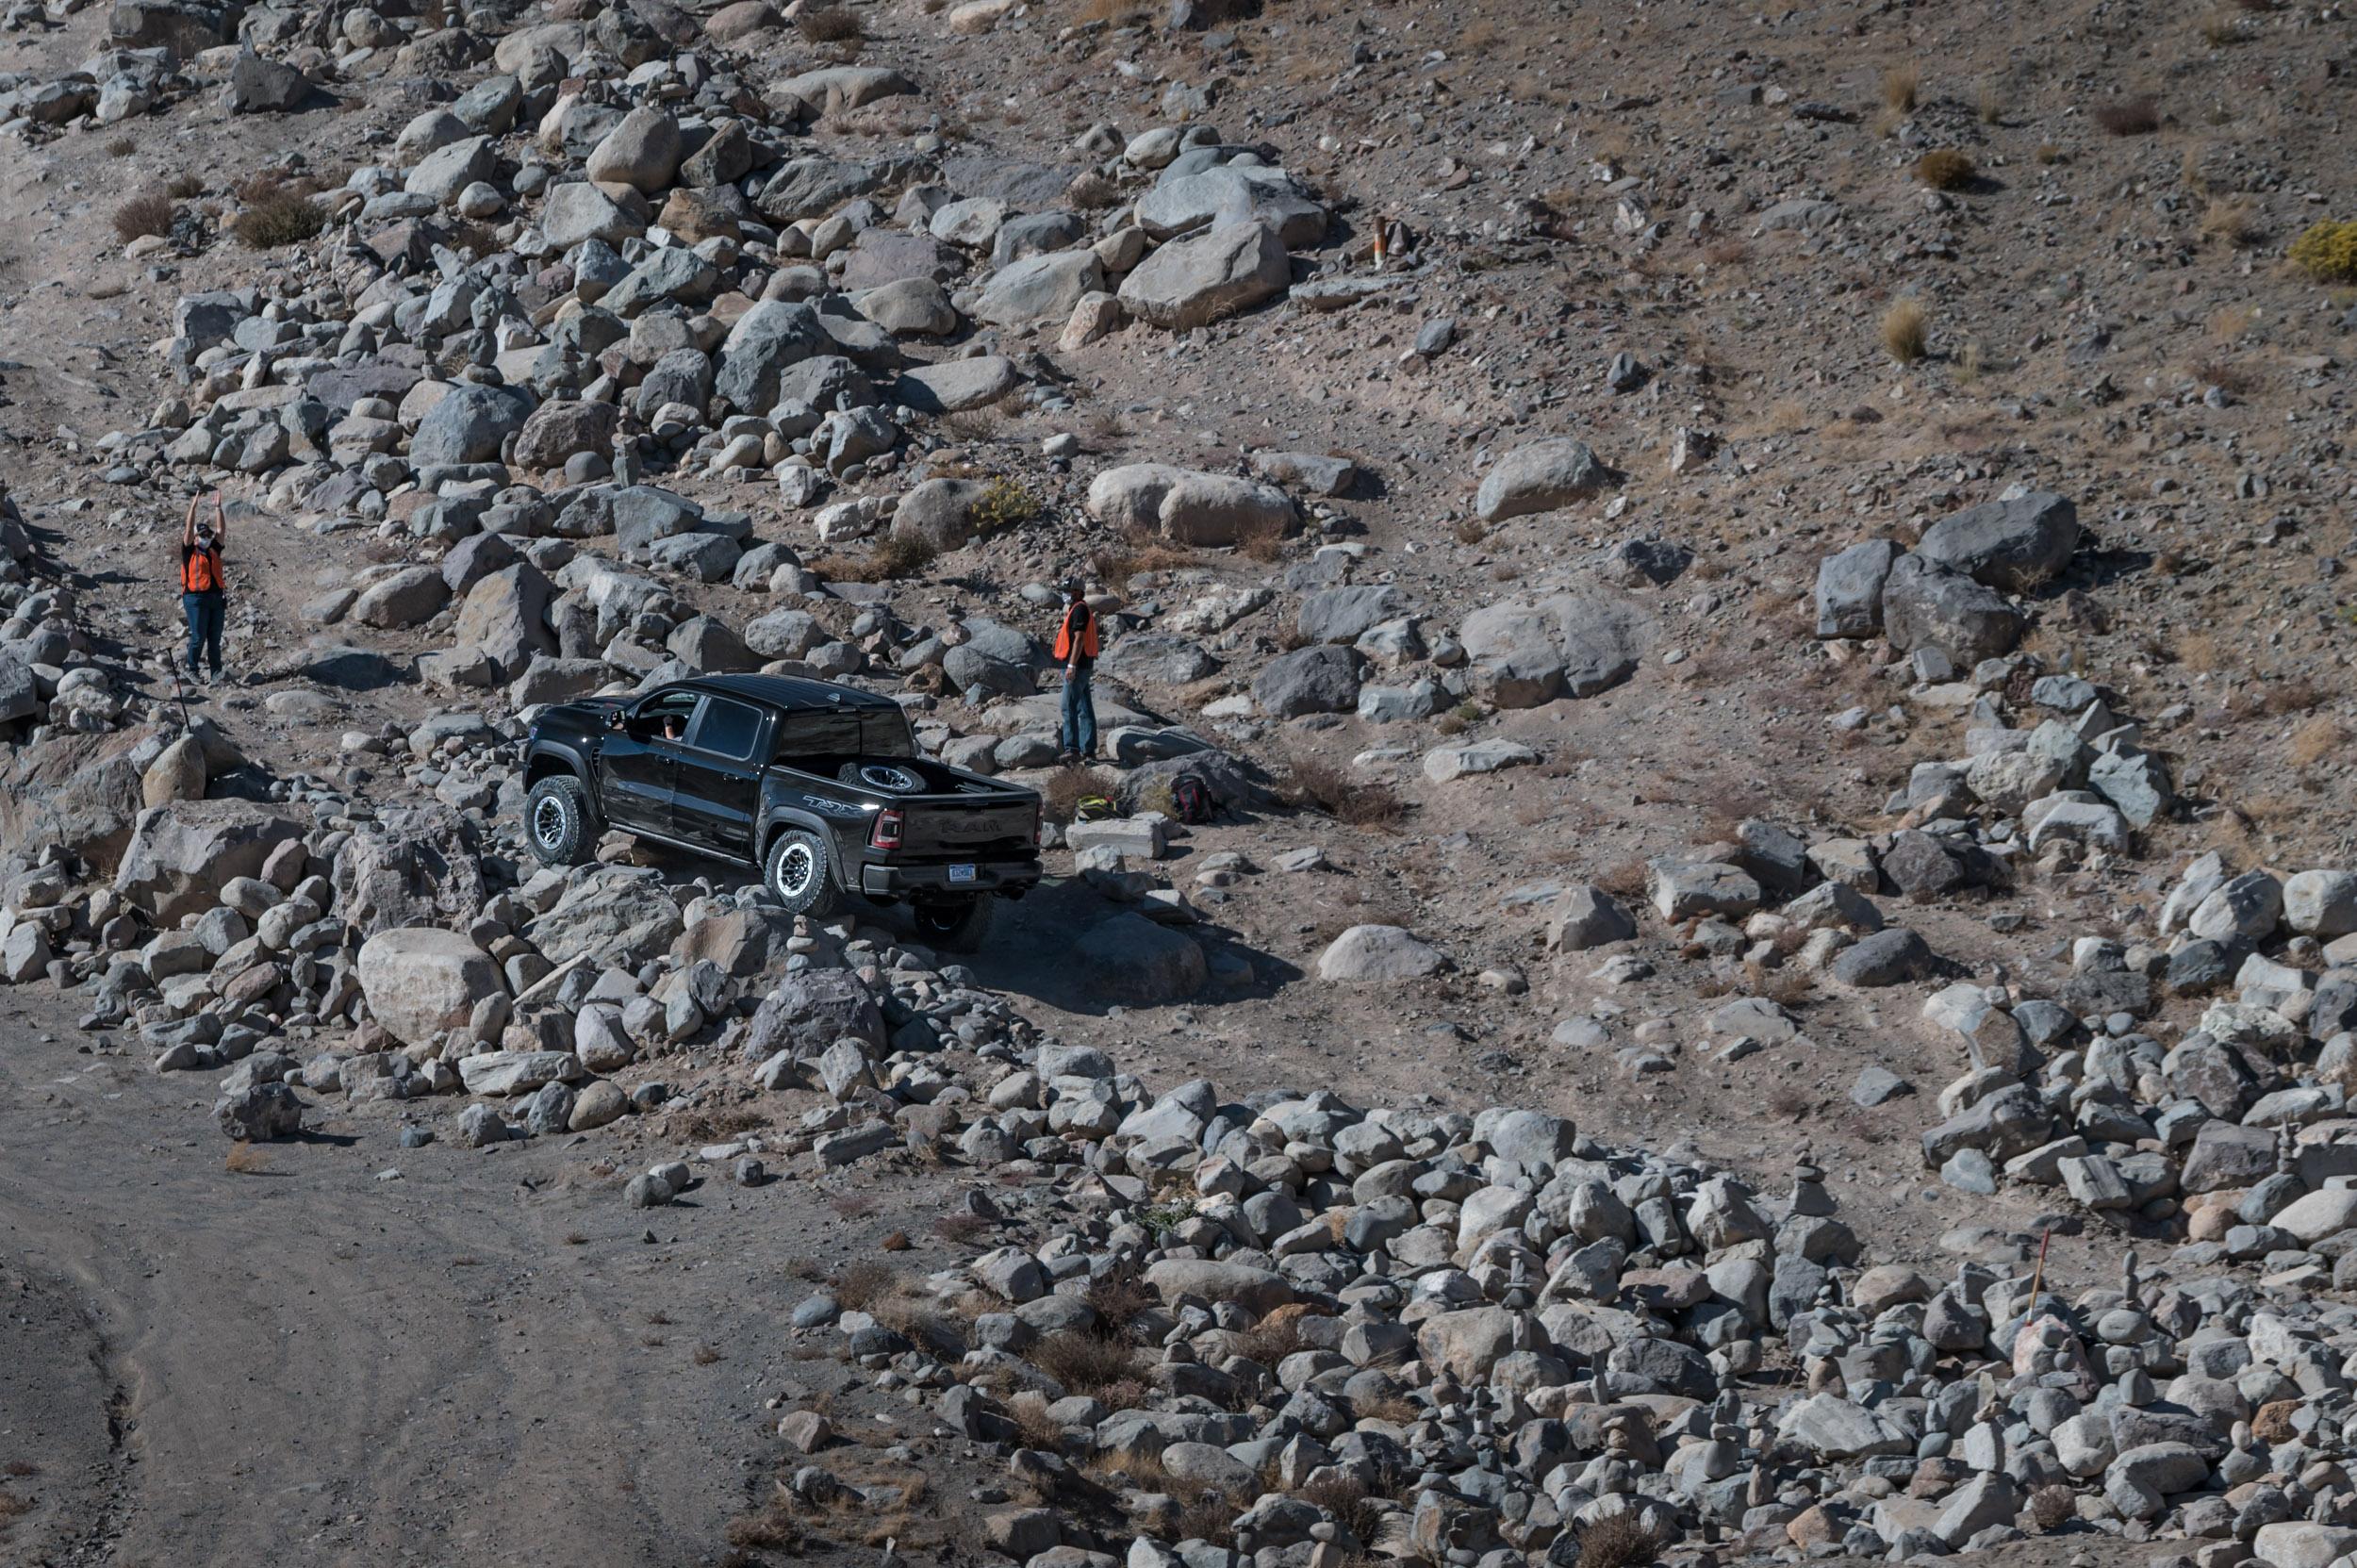 2021 RAM 1500 TRX rock crawl